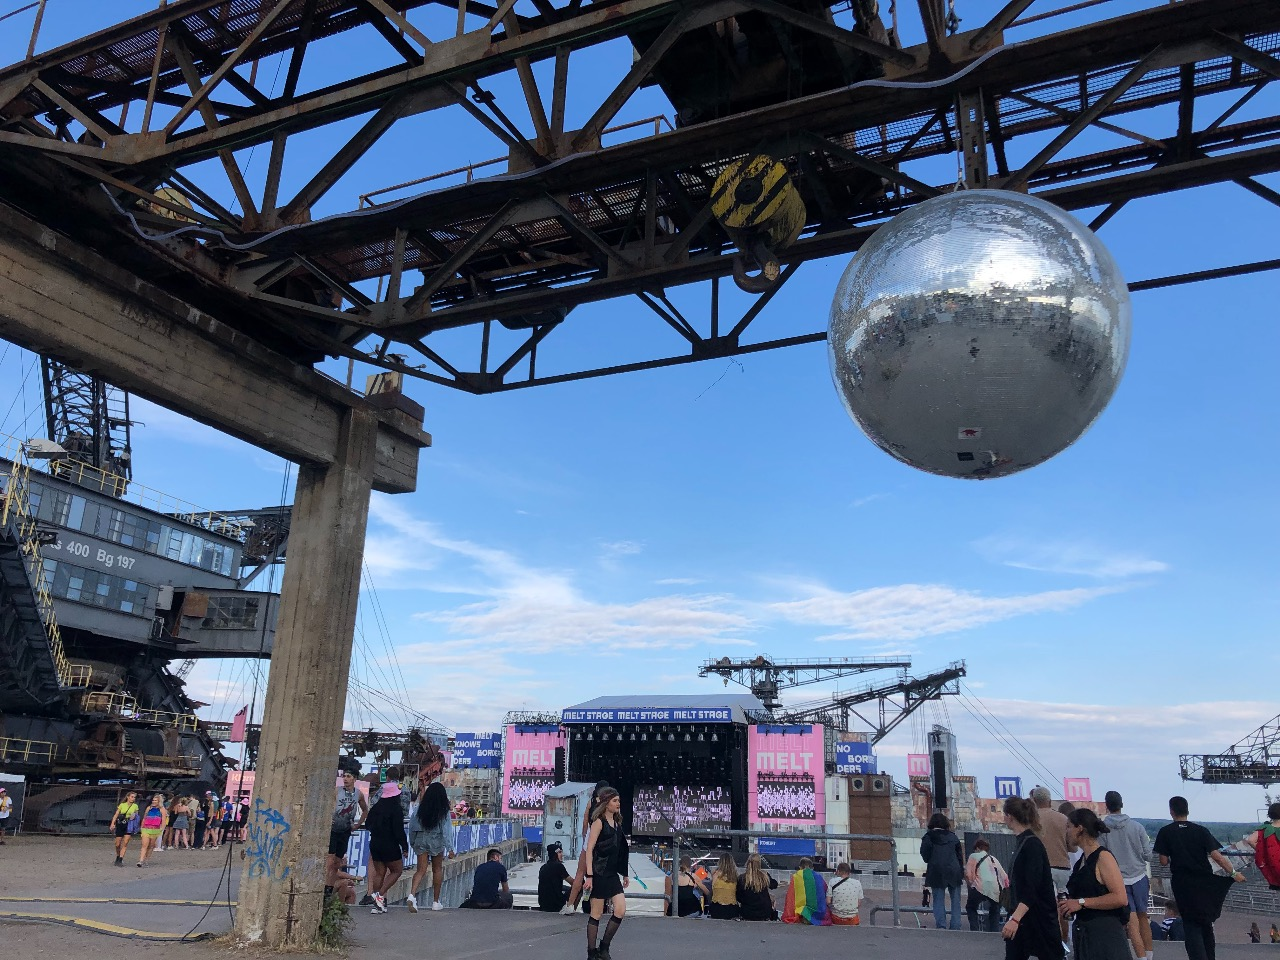 Atmosphäre am Melt! Festival 2019